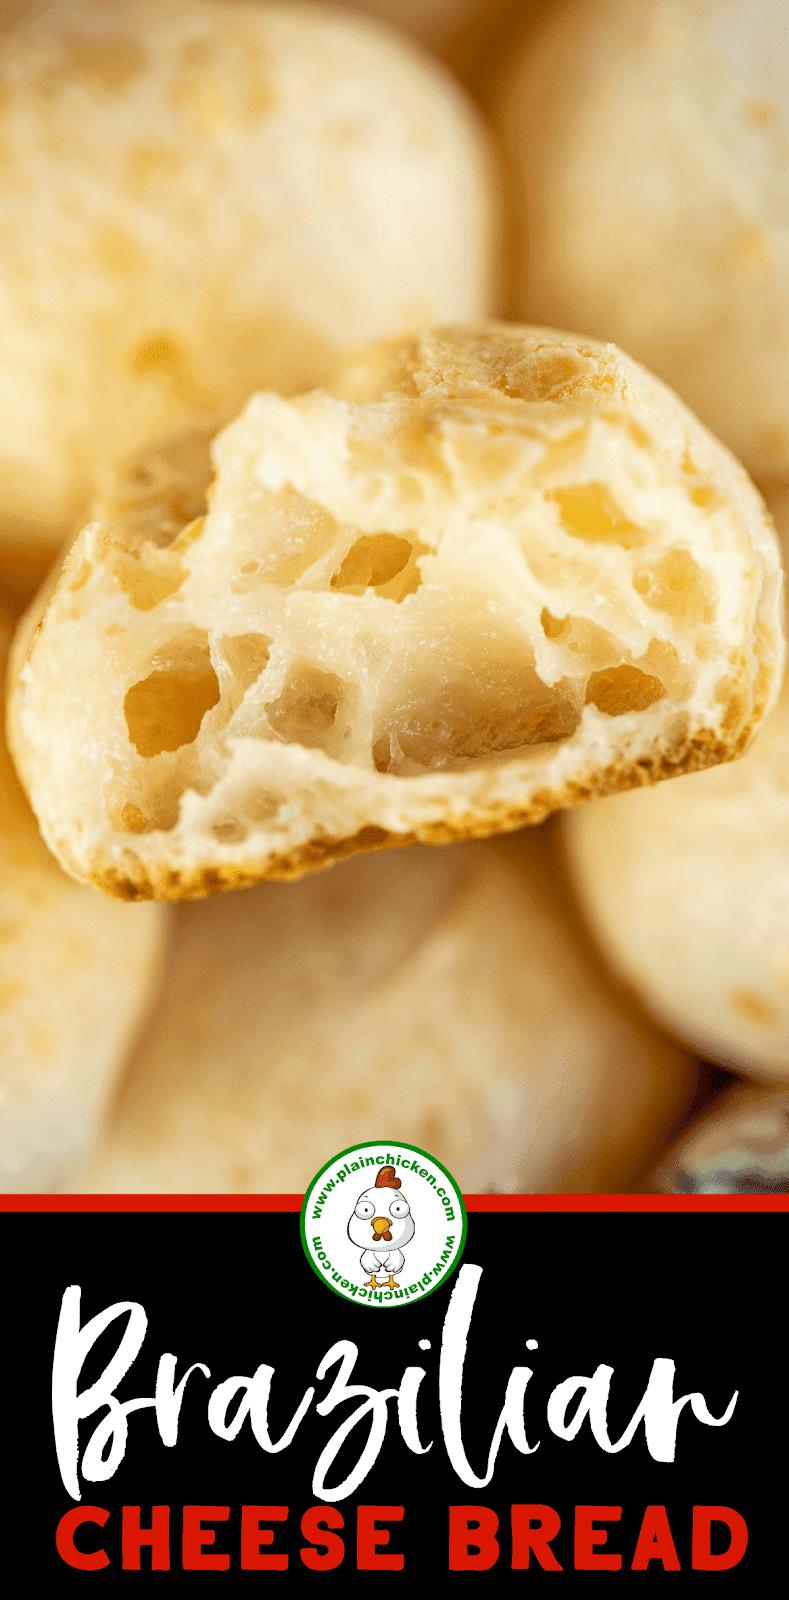 Brazilian Cheese Bread Pao De Queijo Tastes Just Like The Fancy Brazilian Steakhouse Bread Super Easy To Make Bread Easy Cake Recipes Plain Chicken Recipe